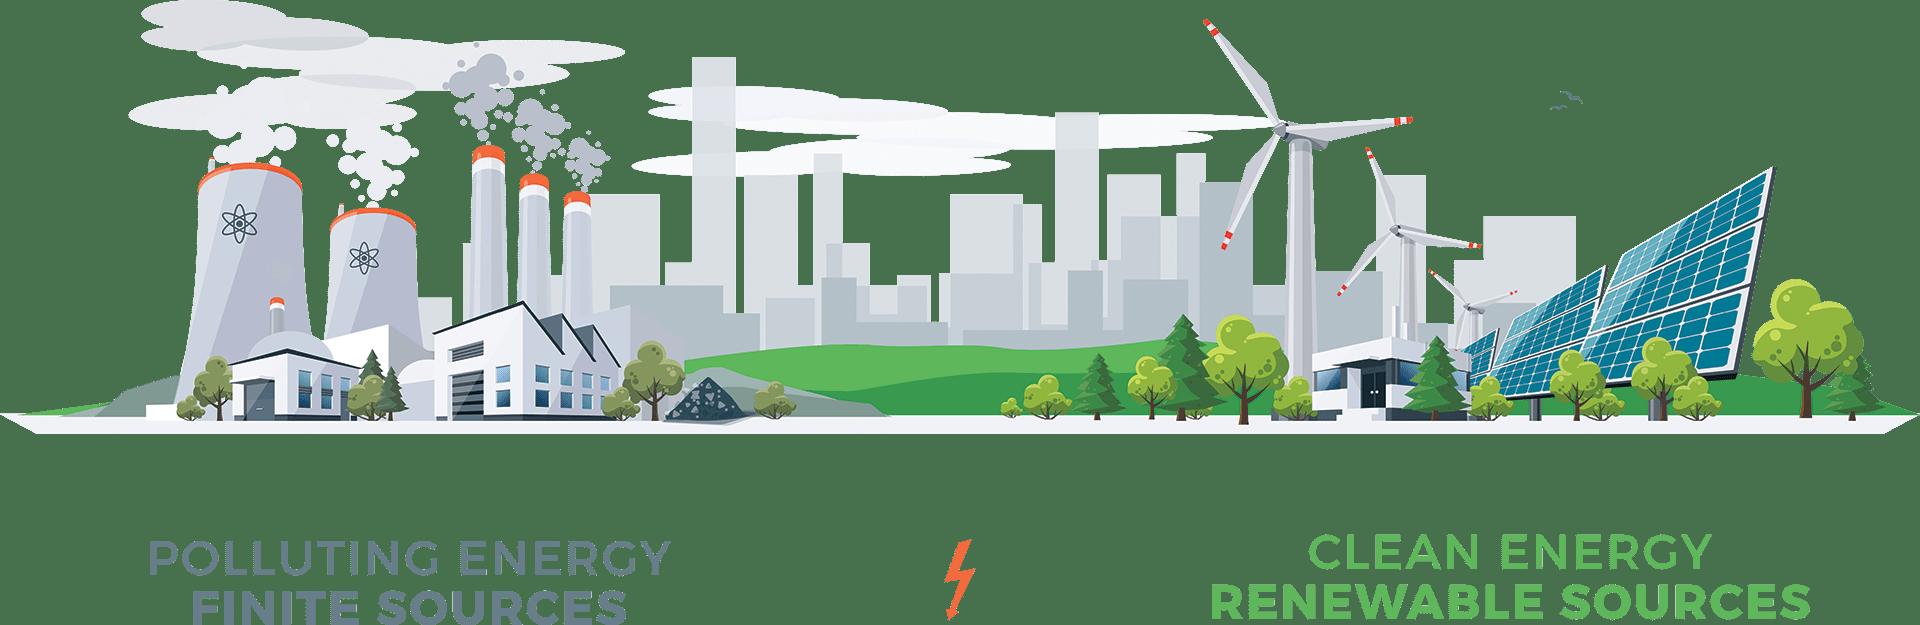 Solar Infographic - Clean Renewable Energy